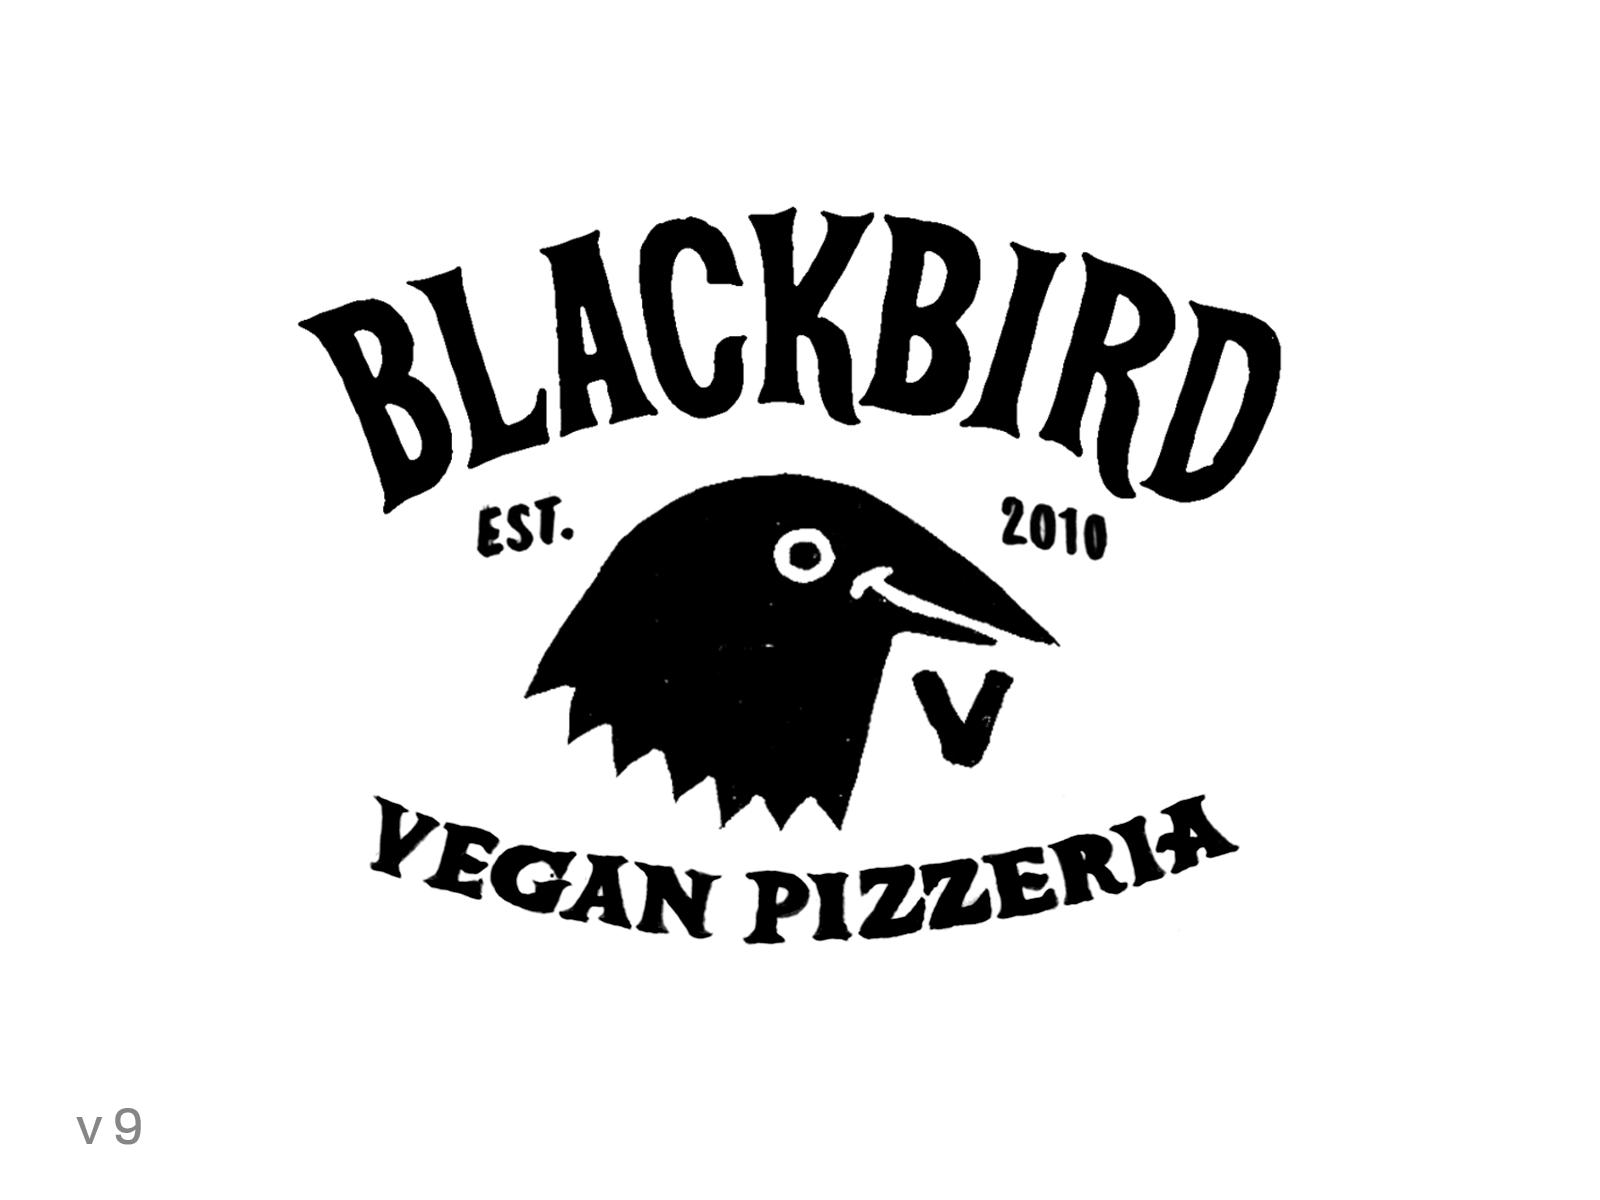 Blackbird_PencilArtV3_p11.png